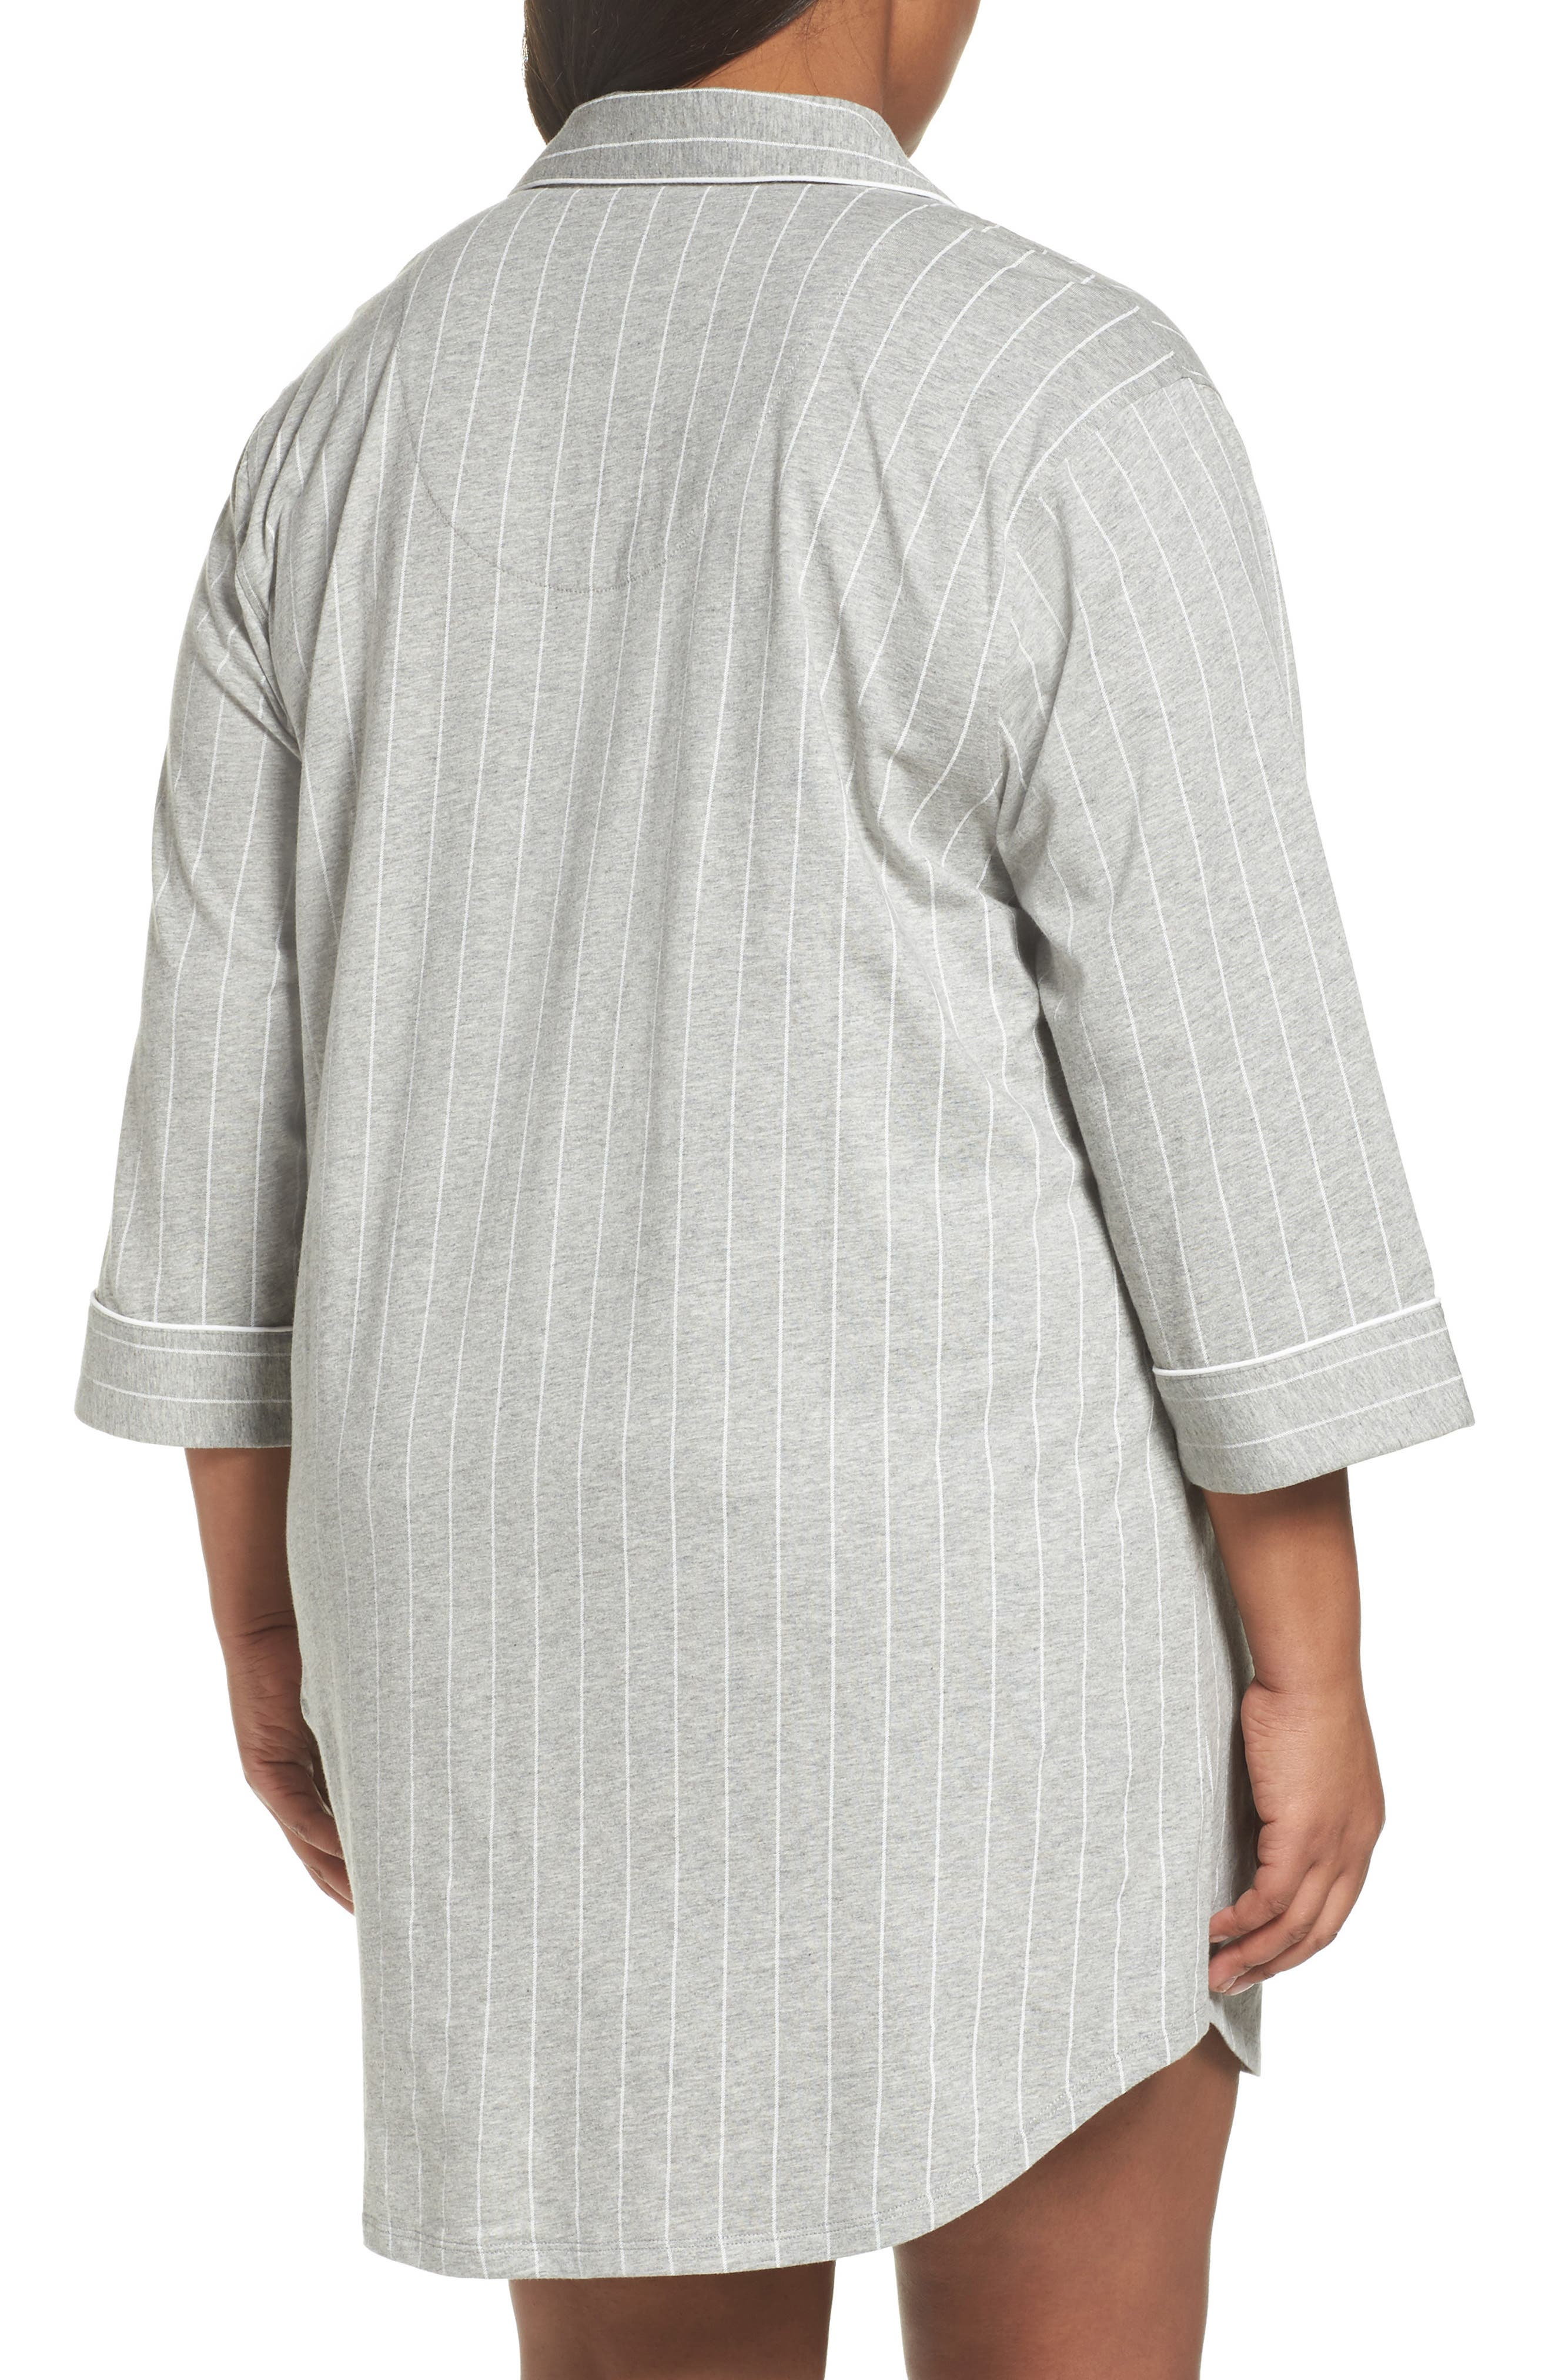 Knit Jersey Sleep Shirt,                             Alternate thumbnail 2, color,                             Greystone